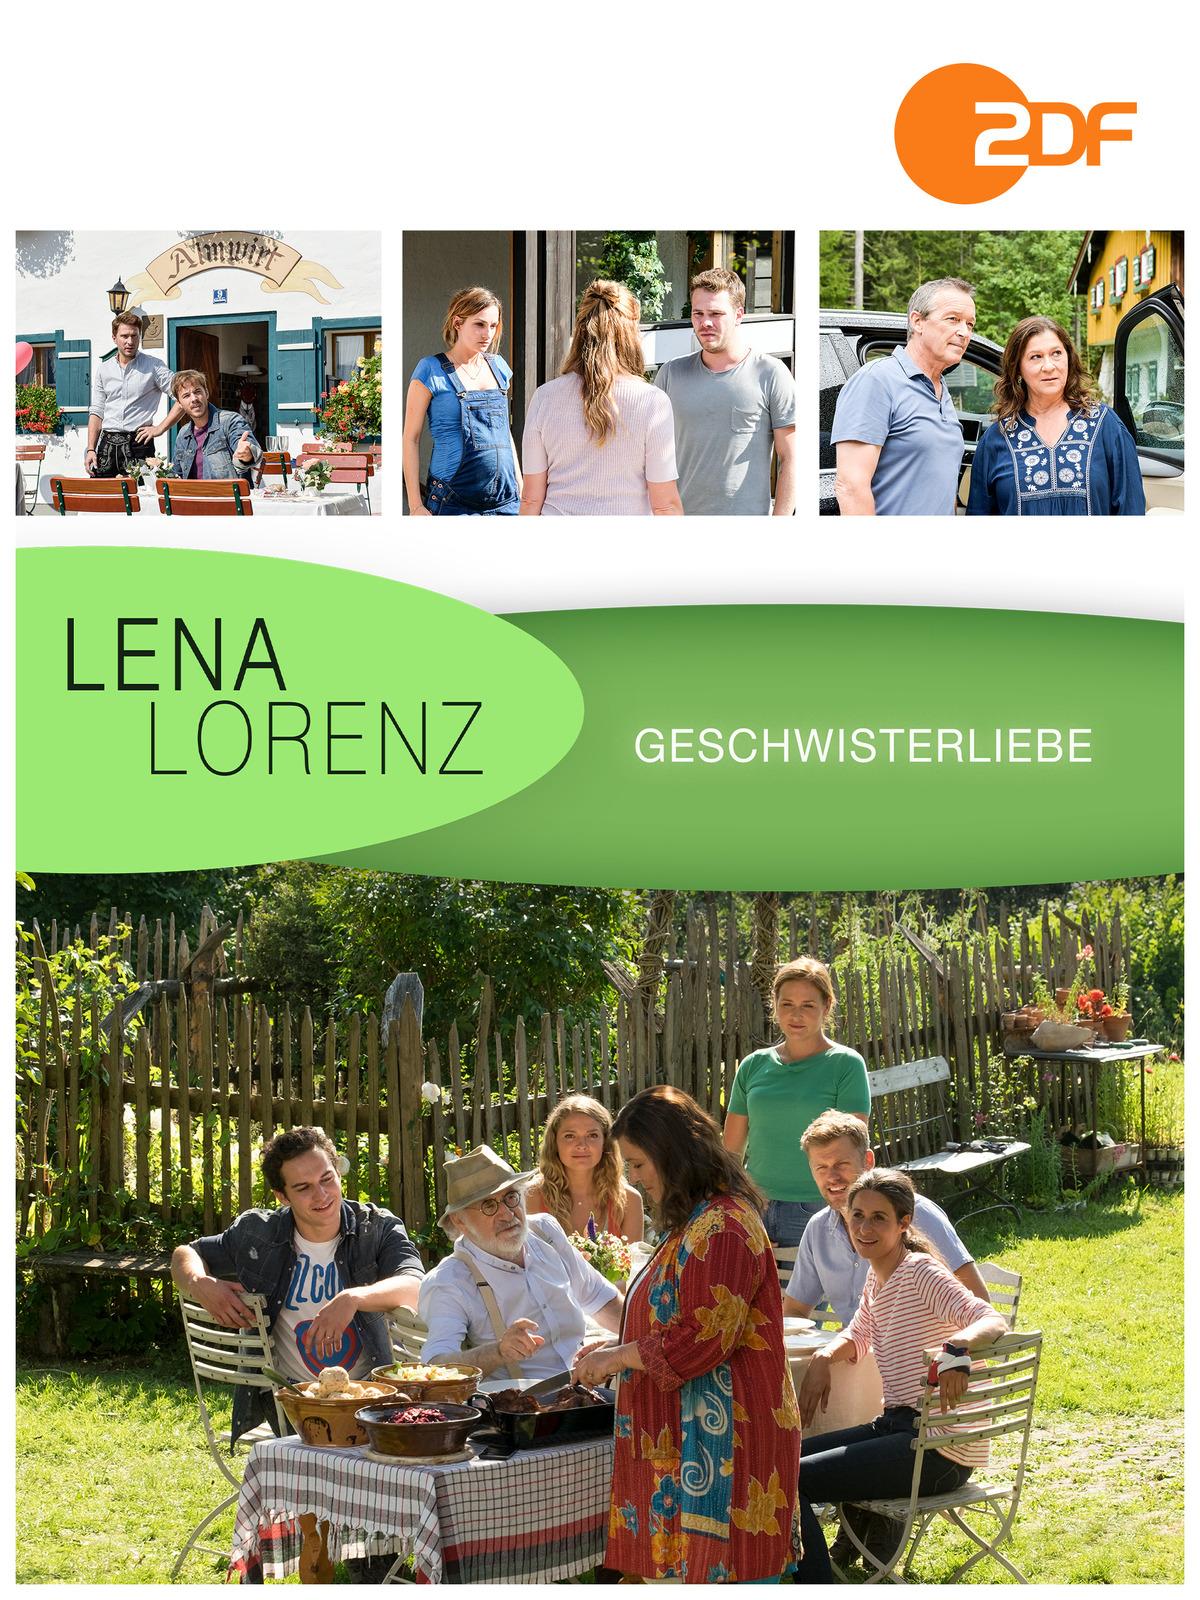 Lena Lorenz: Geschwisterliebe